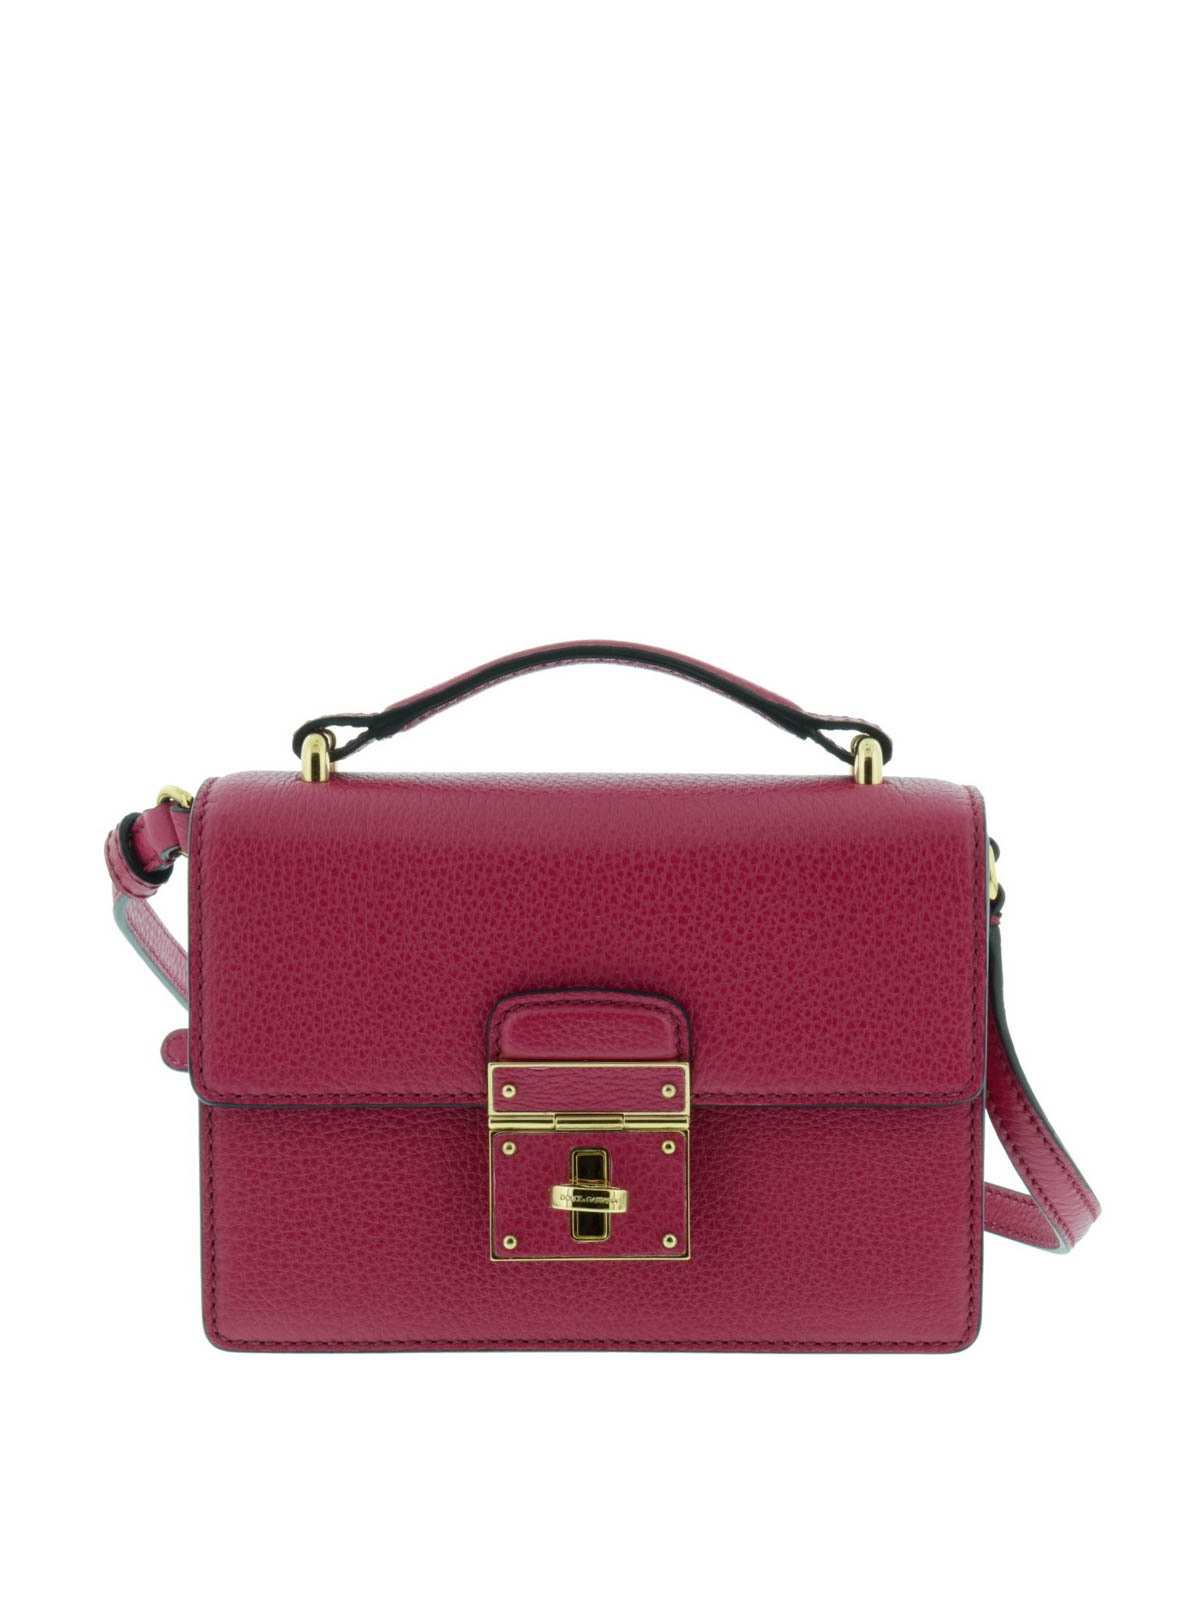 67a9fb2974a4 Dolce   Gabbana - Lock closure mini Rosalia bag - cross body bags ...